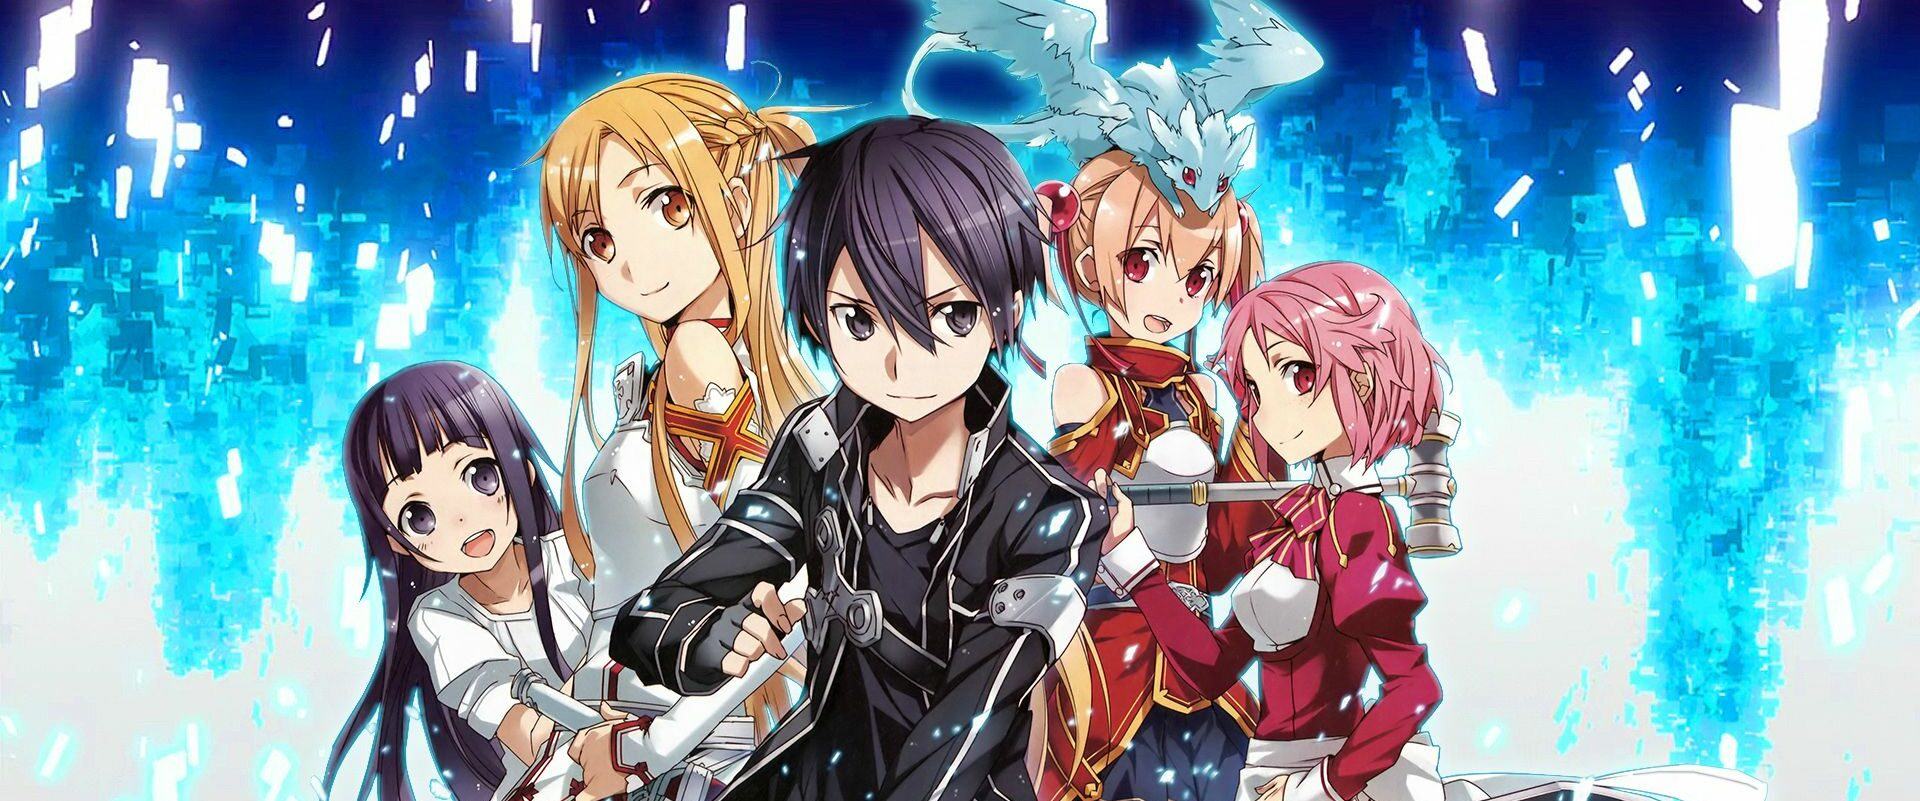 Sword Art Online Re : Hollow Fragment